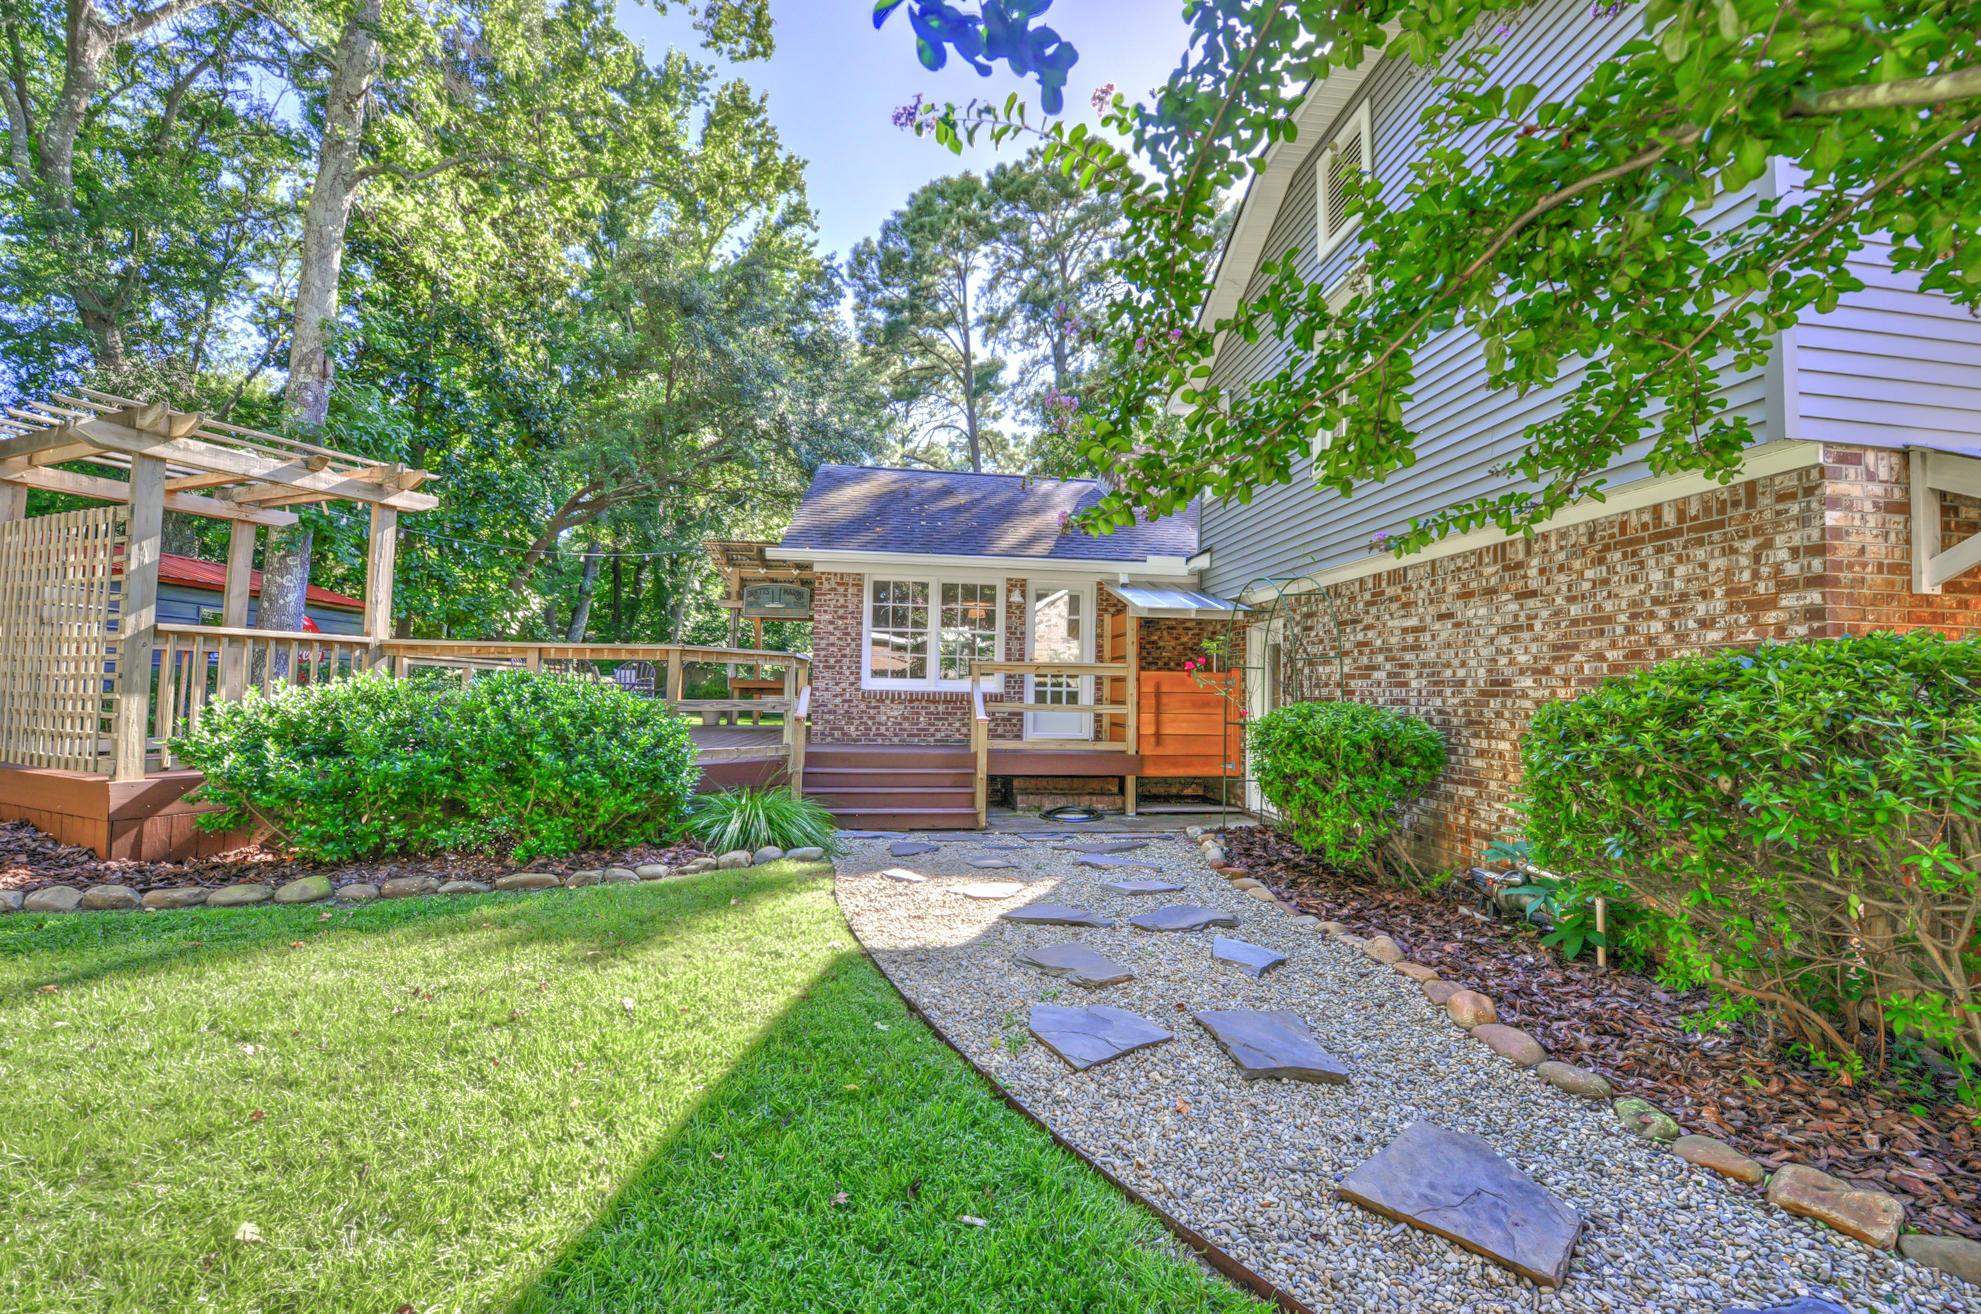 Shemwood II Homes For Sale - 1017 Jack Snipe, Mount Pleasant, SC - 15